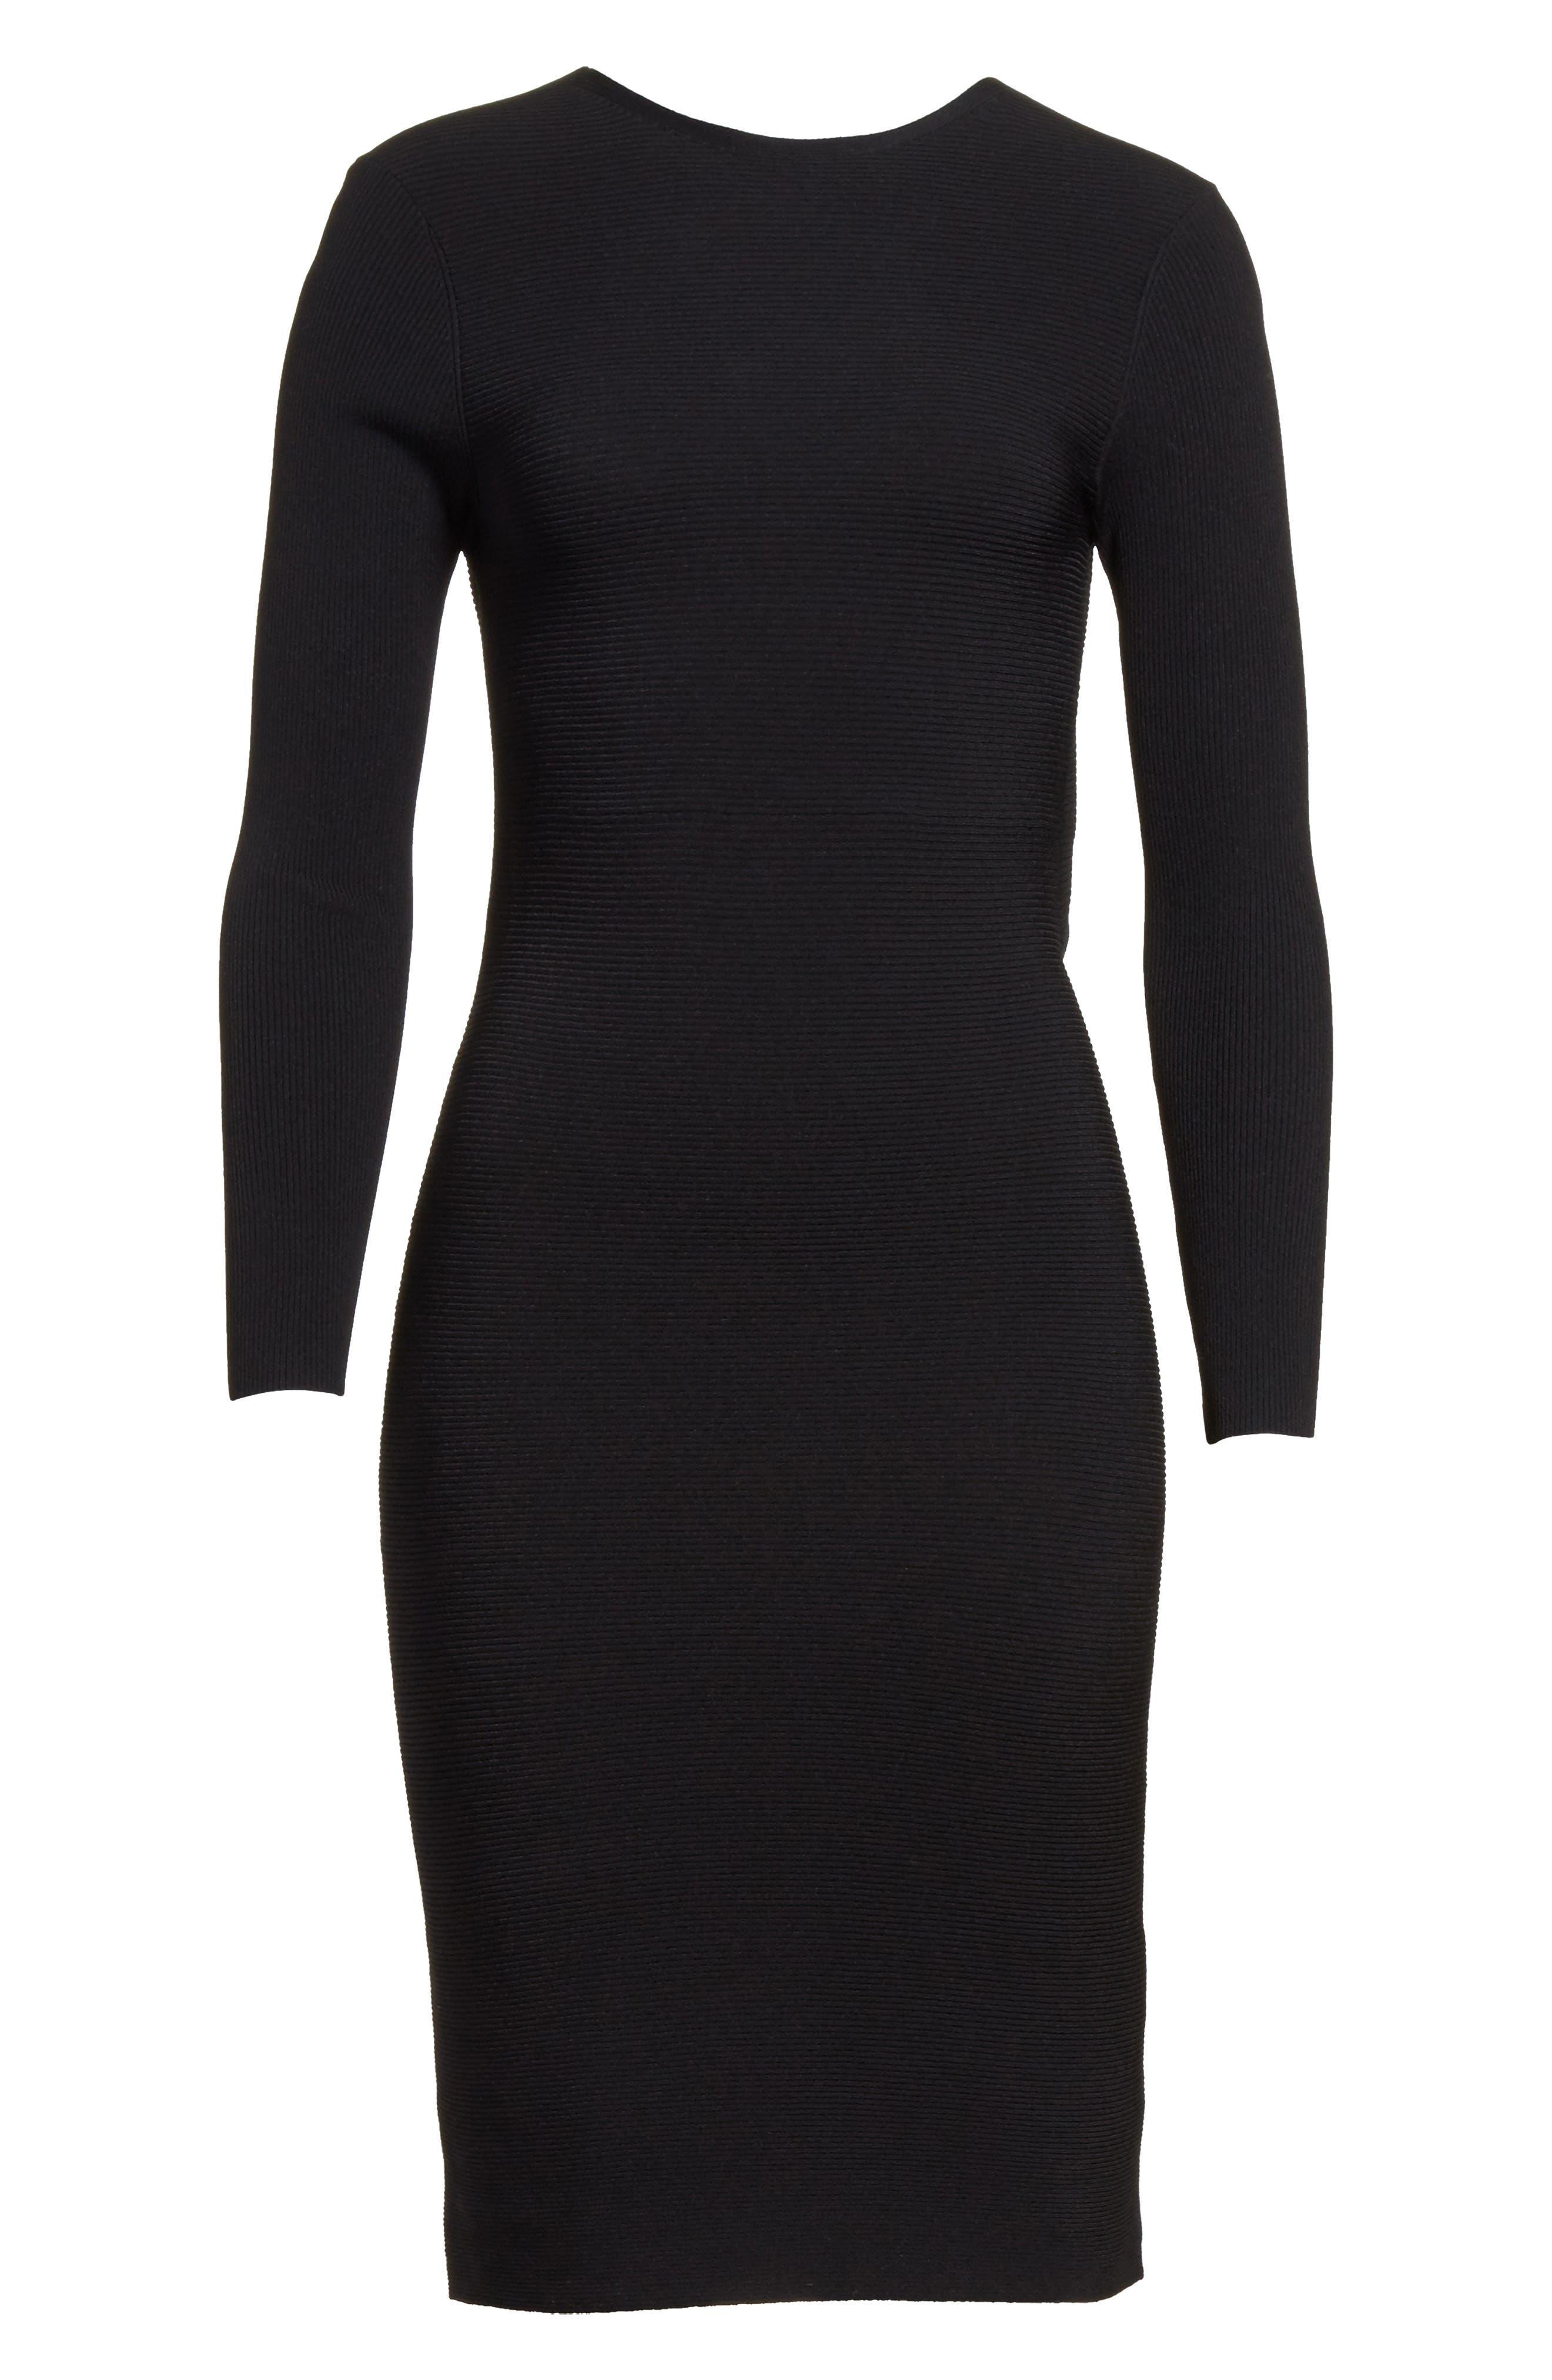 Technical Rib Open Back Dress,                             Alternate thumbnail 6, color,                             001